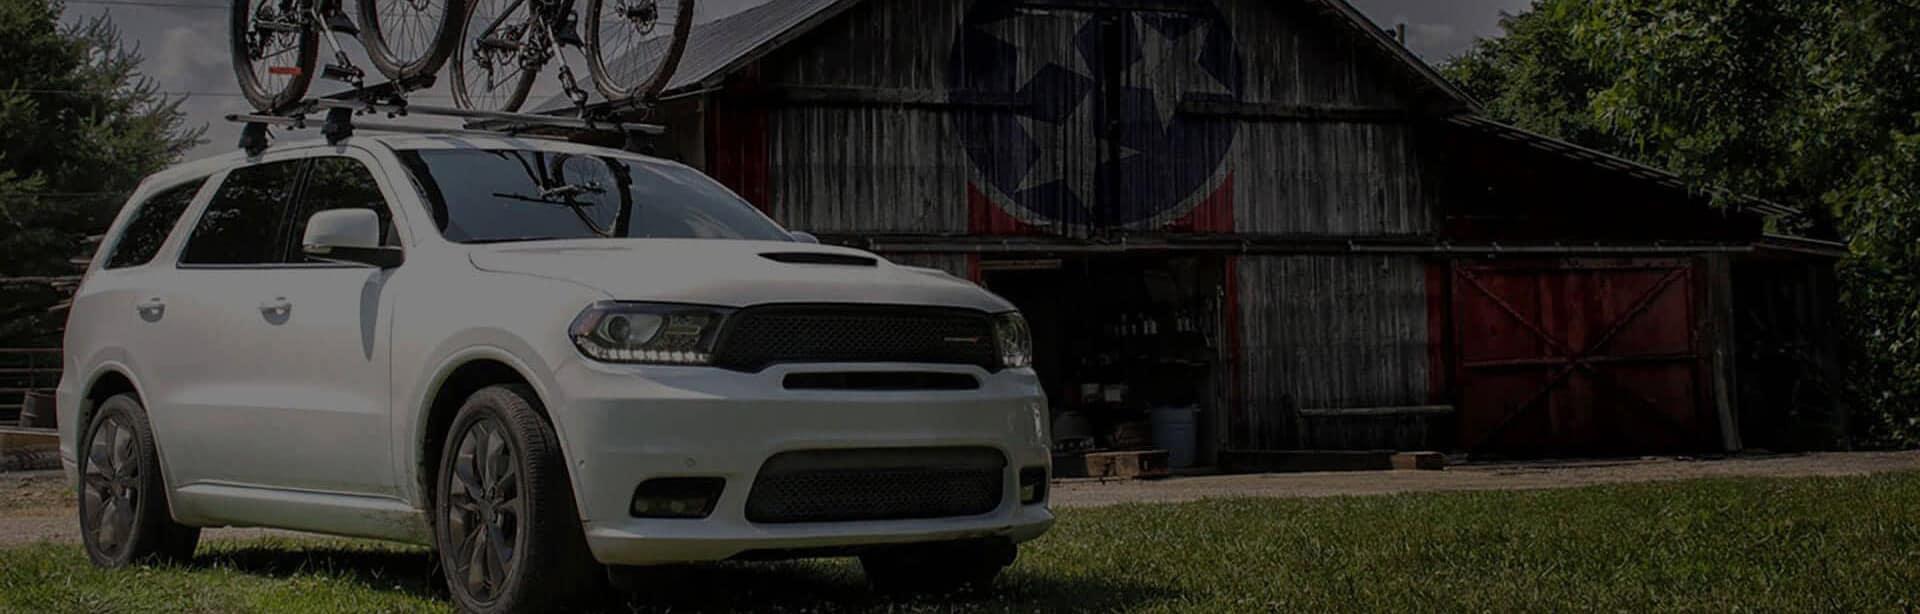 Chrysler Dealer near Fort Wayne, Indiana.